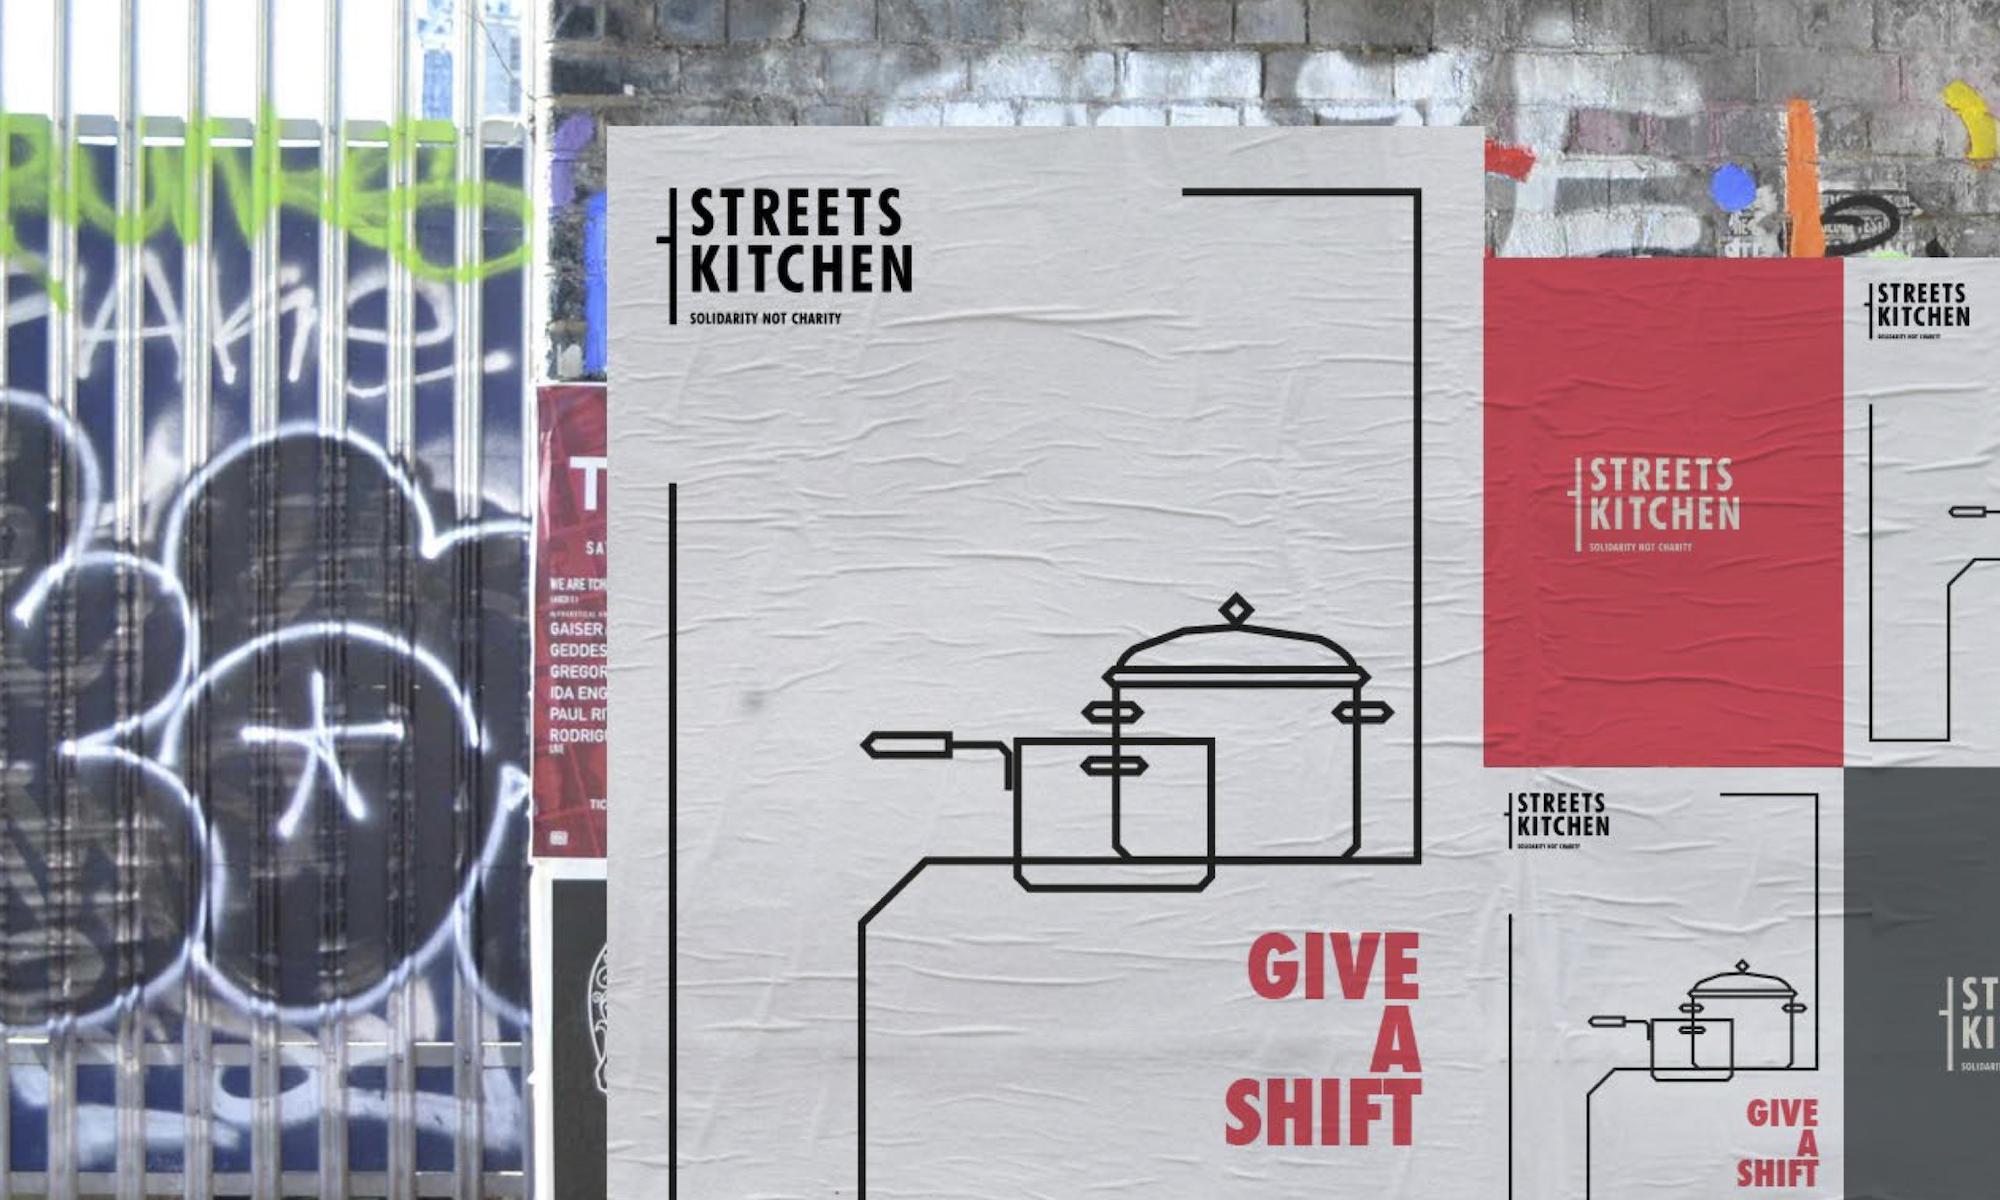 Streets Kitchen